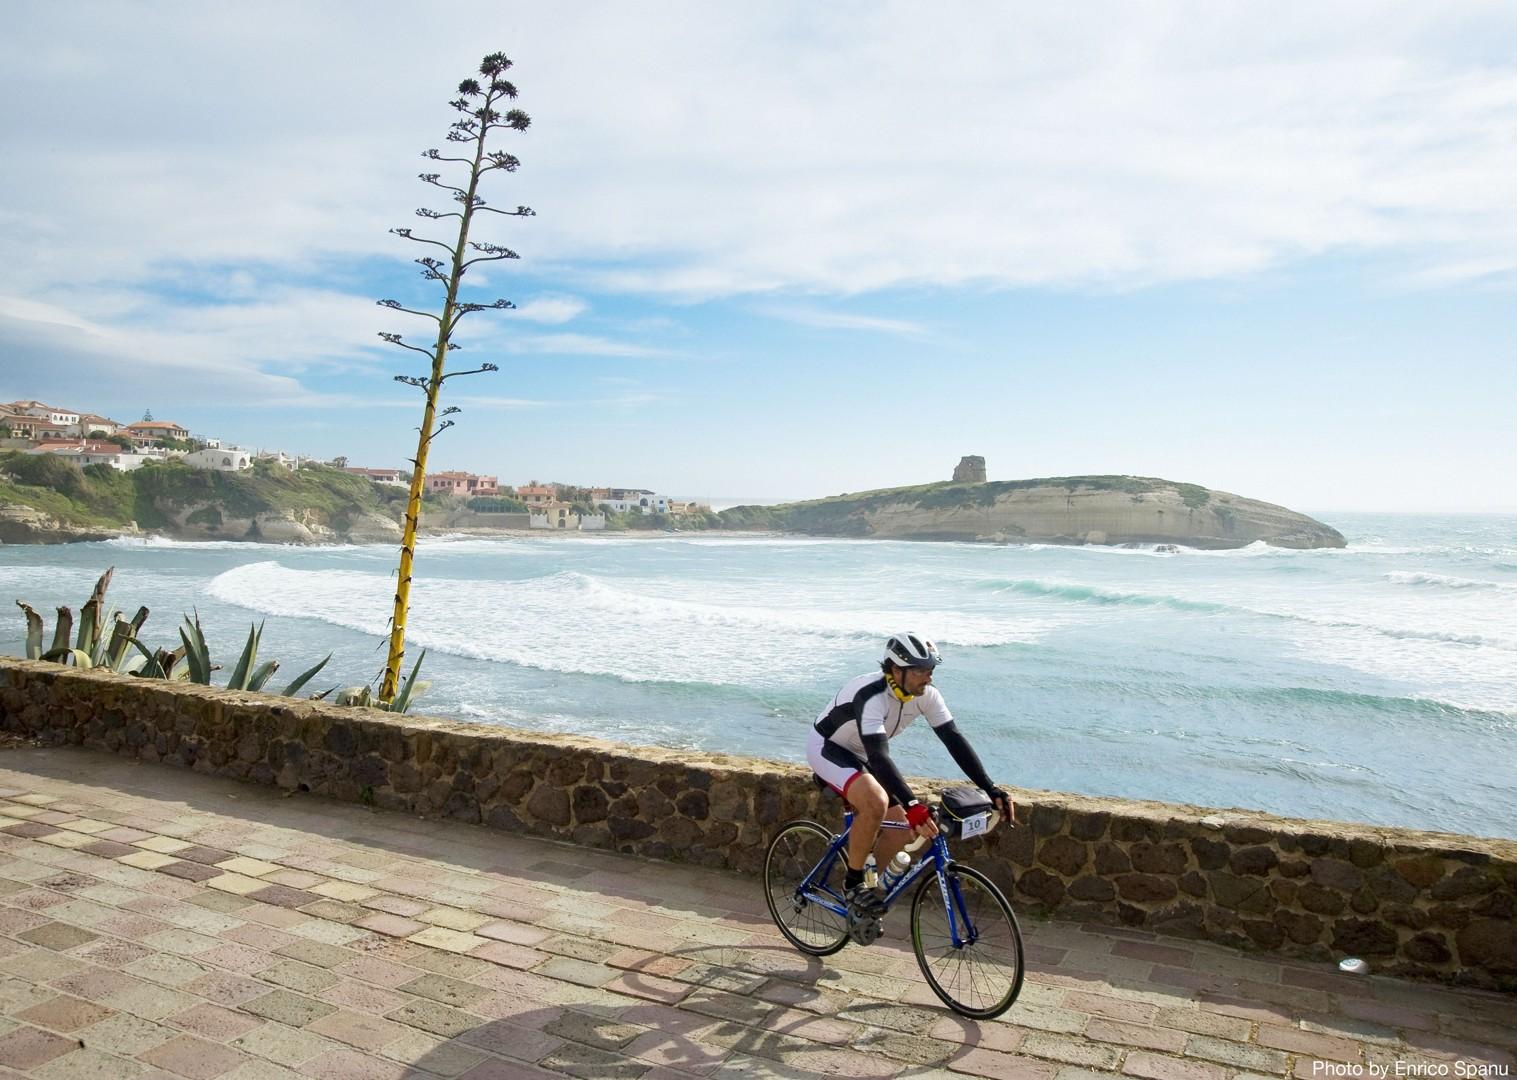 Road-Cycling-Holiday-Coastal-Explorer-Sardinia-Italy.jpg - Italy - Sardinia - Coastal Explorer - Self Guided Road Cycling Holiday - Italia Road Cycling